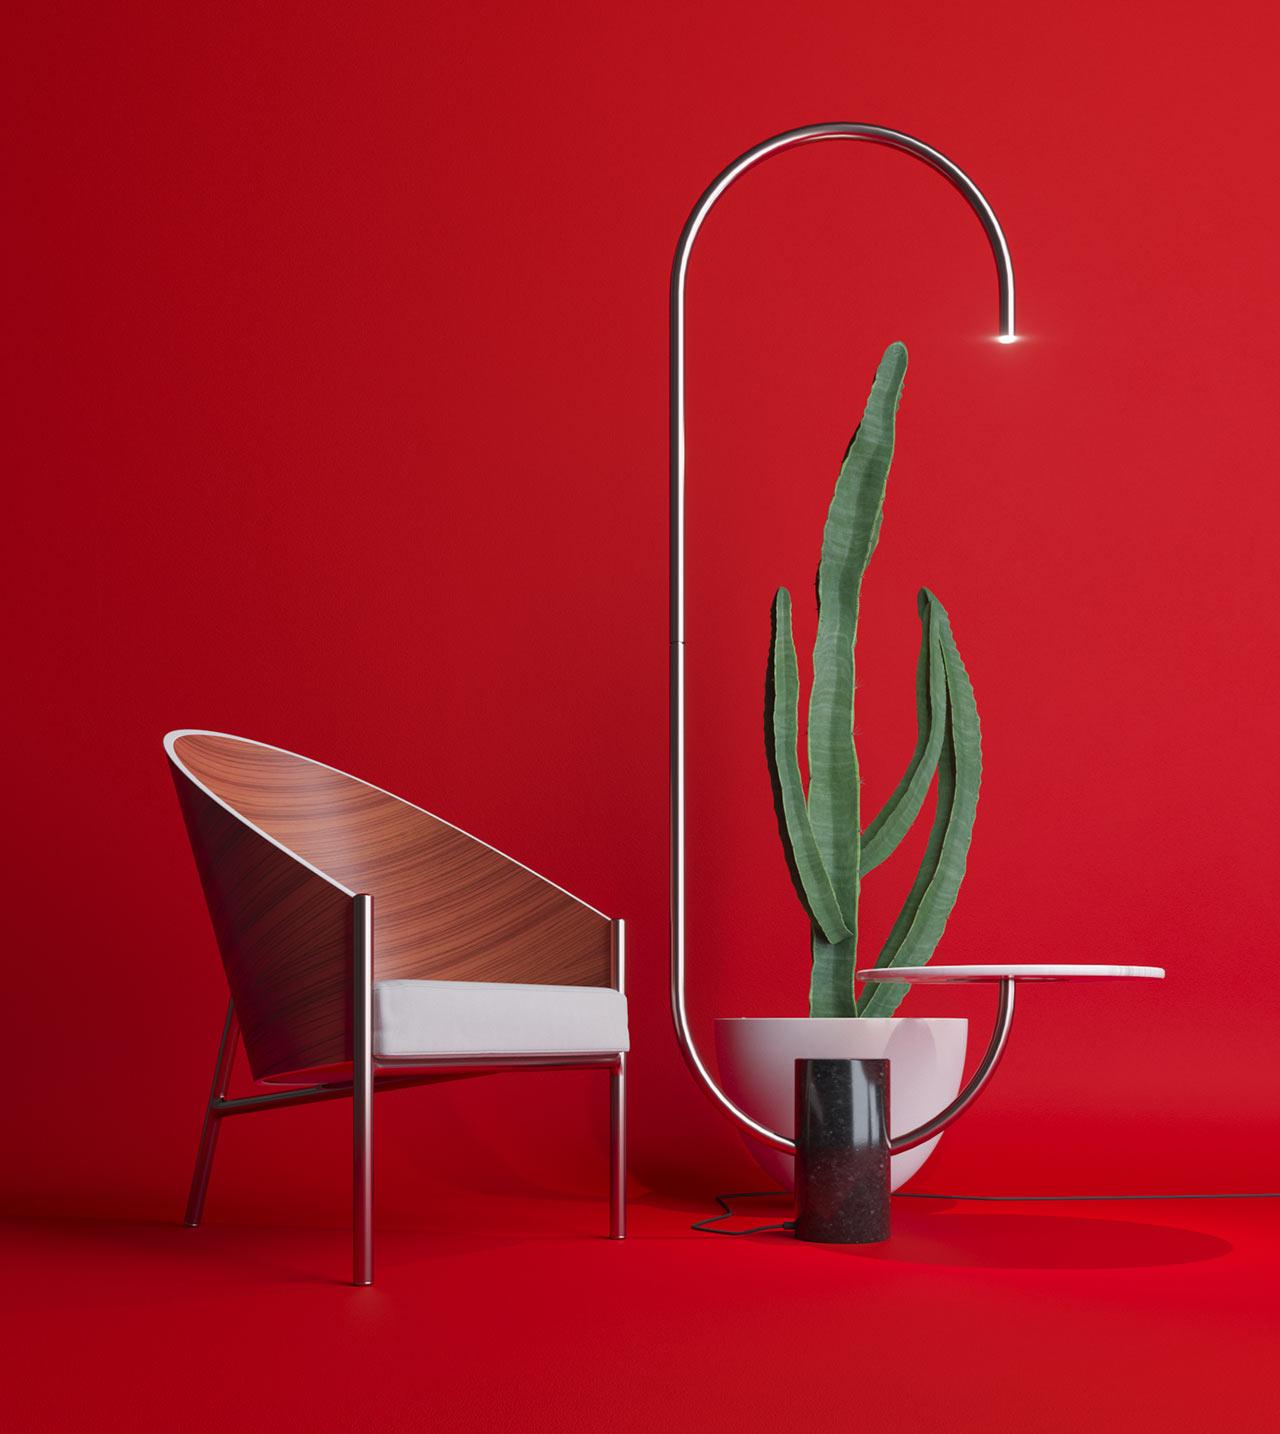 Bijou Lamp + Table by Sergey Makhno Architects